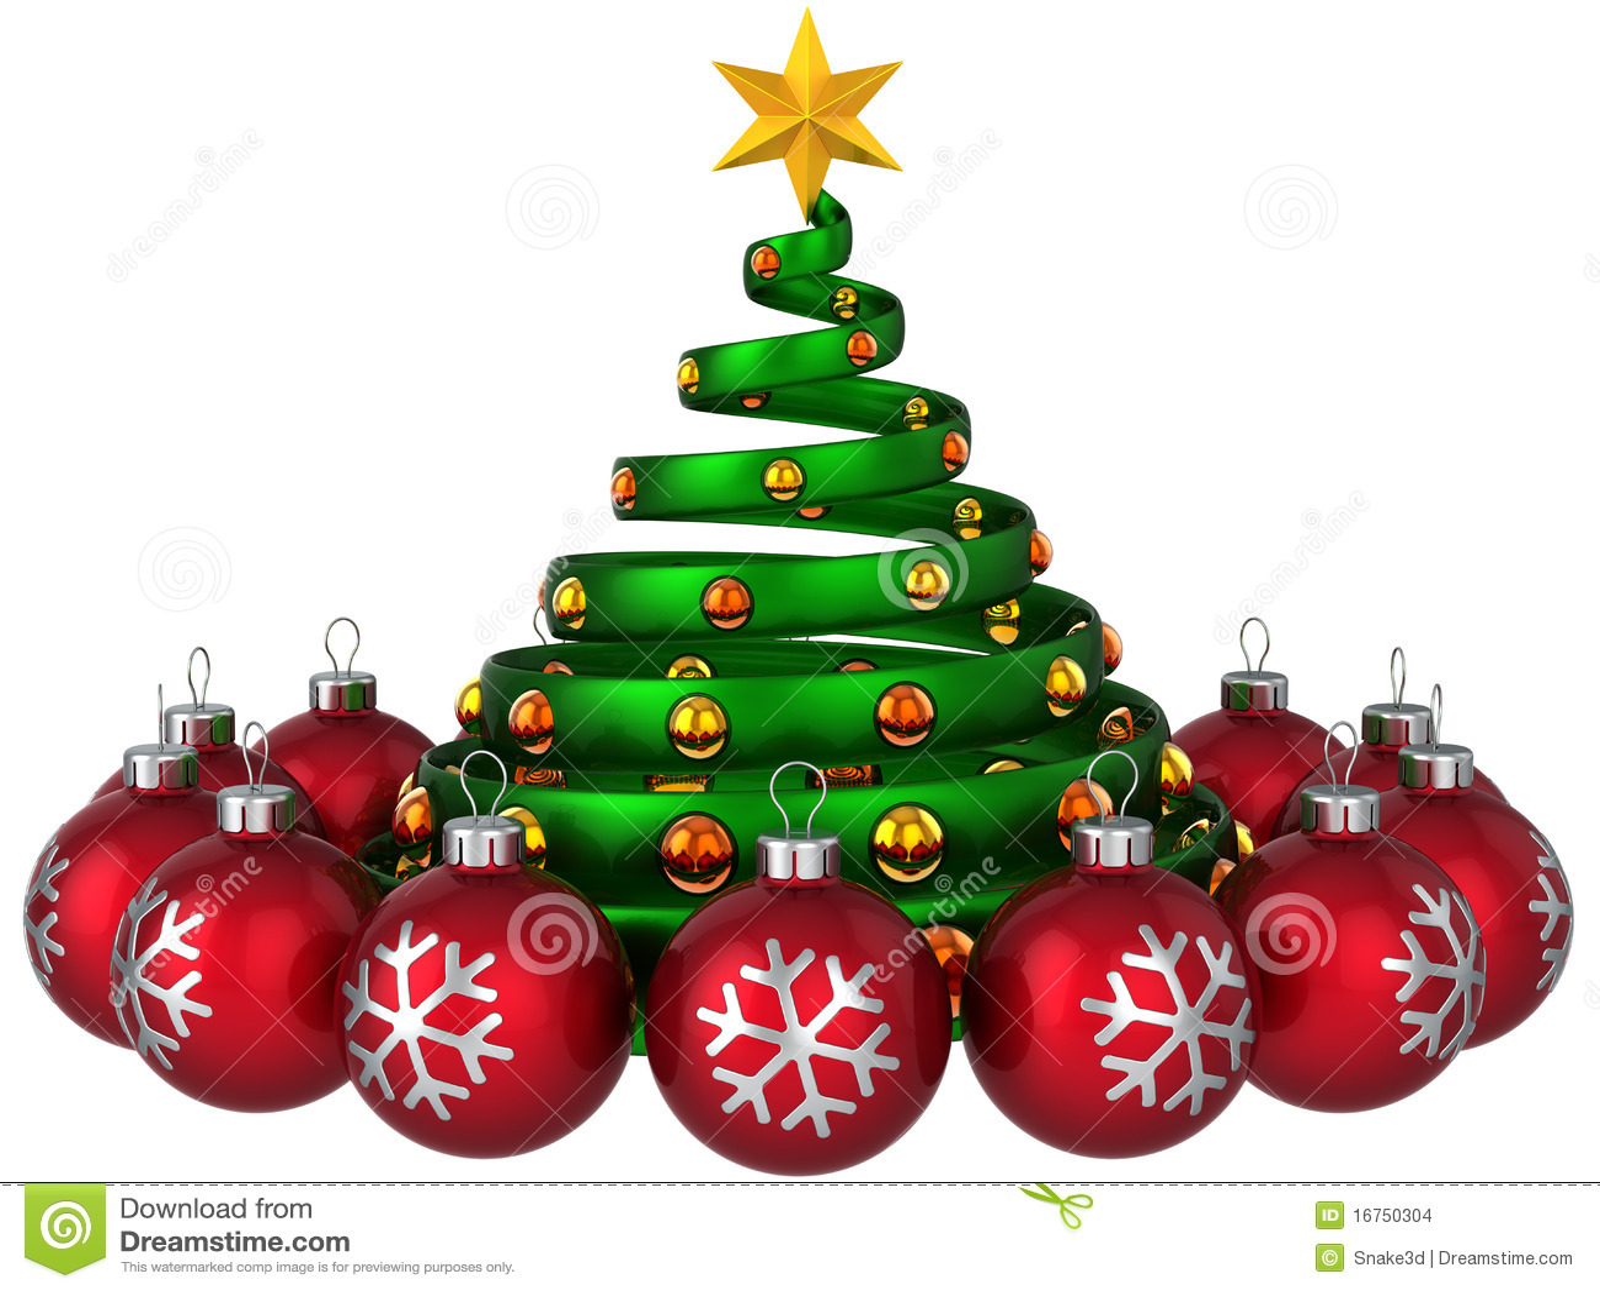 moderner weihnachtsbaum stockbilder bild 16750304. Black Bedroom Furniture Sets. Home Design Ideas